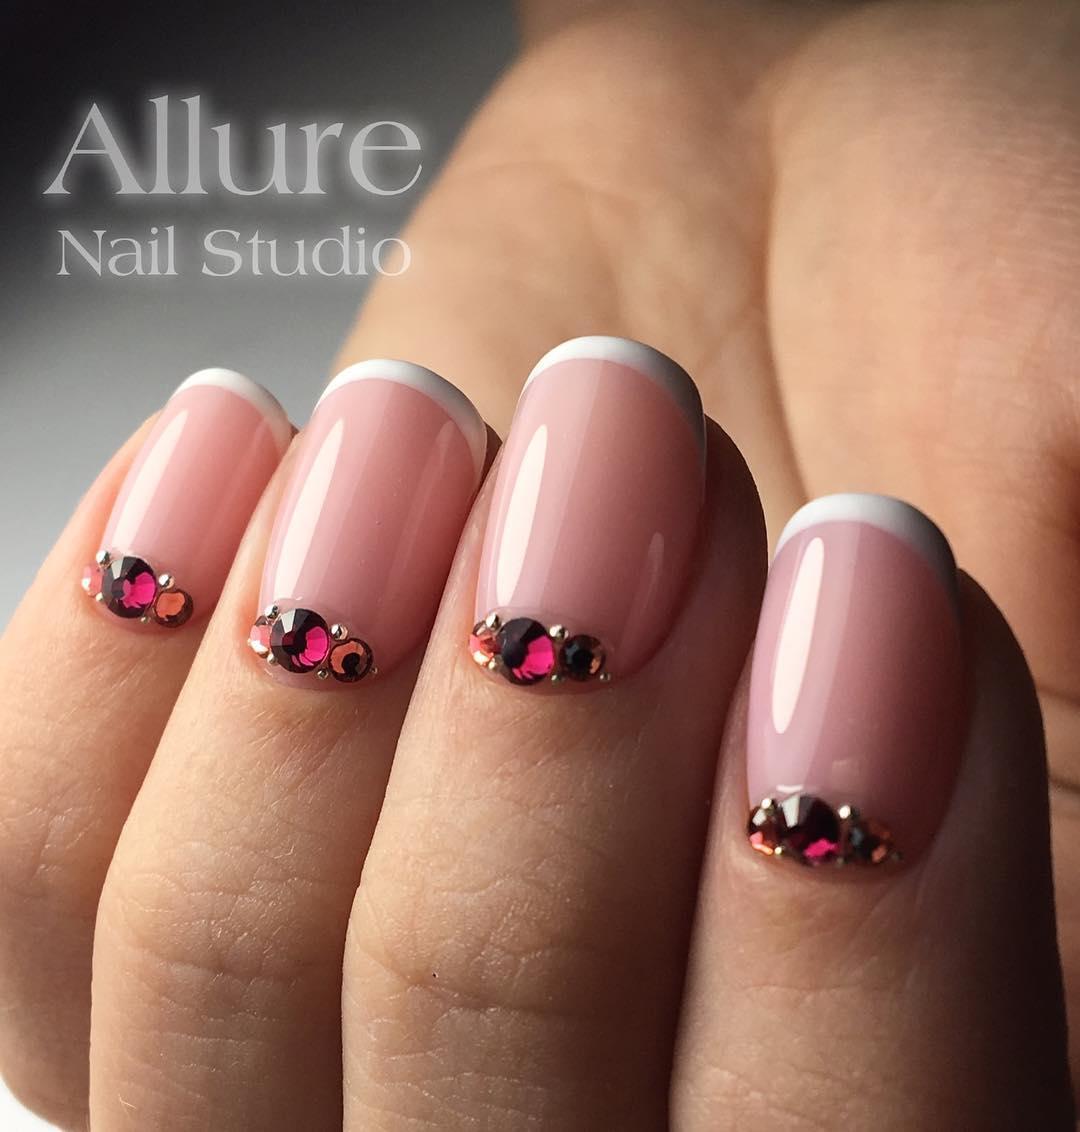 allure_nail_studio.jpg